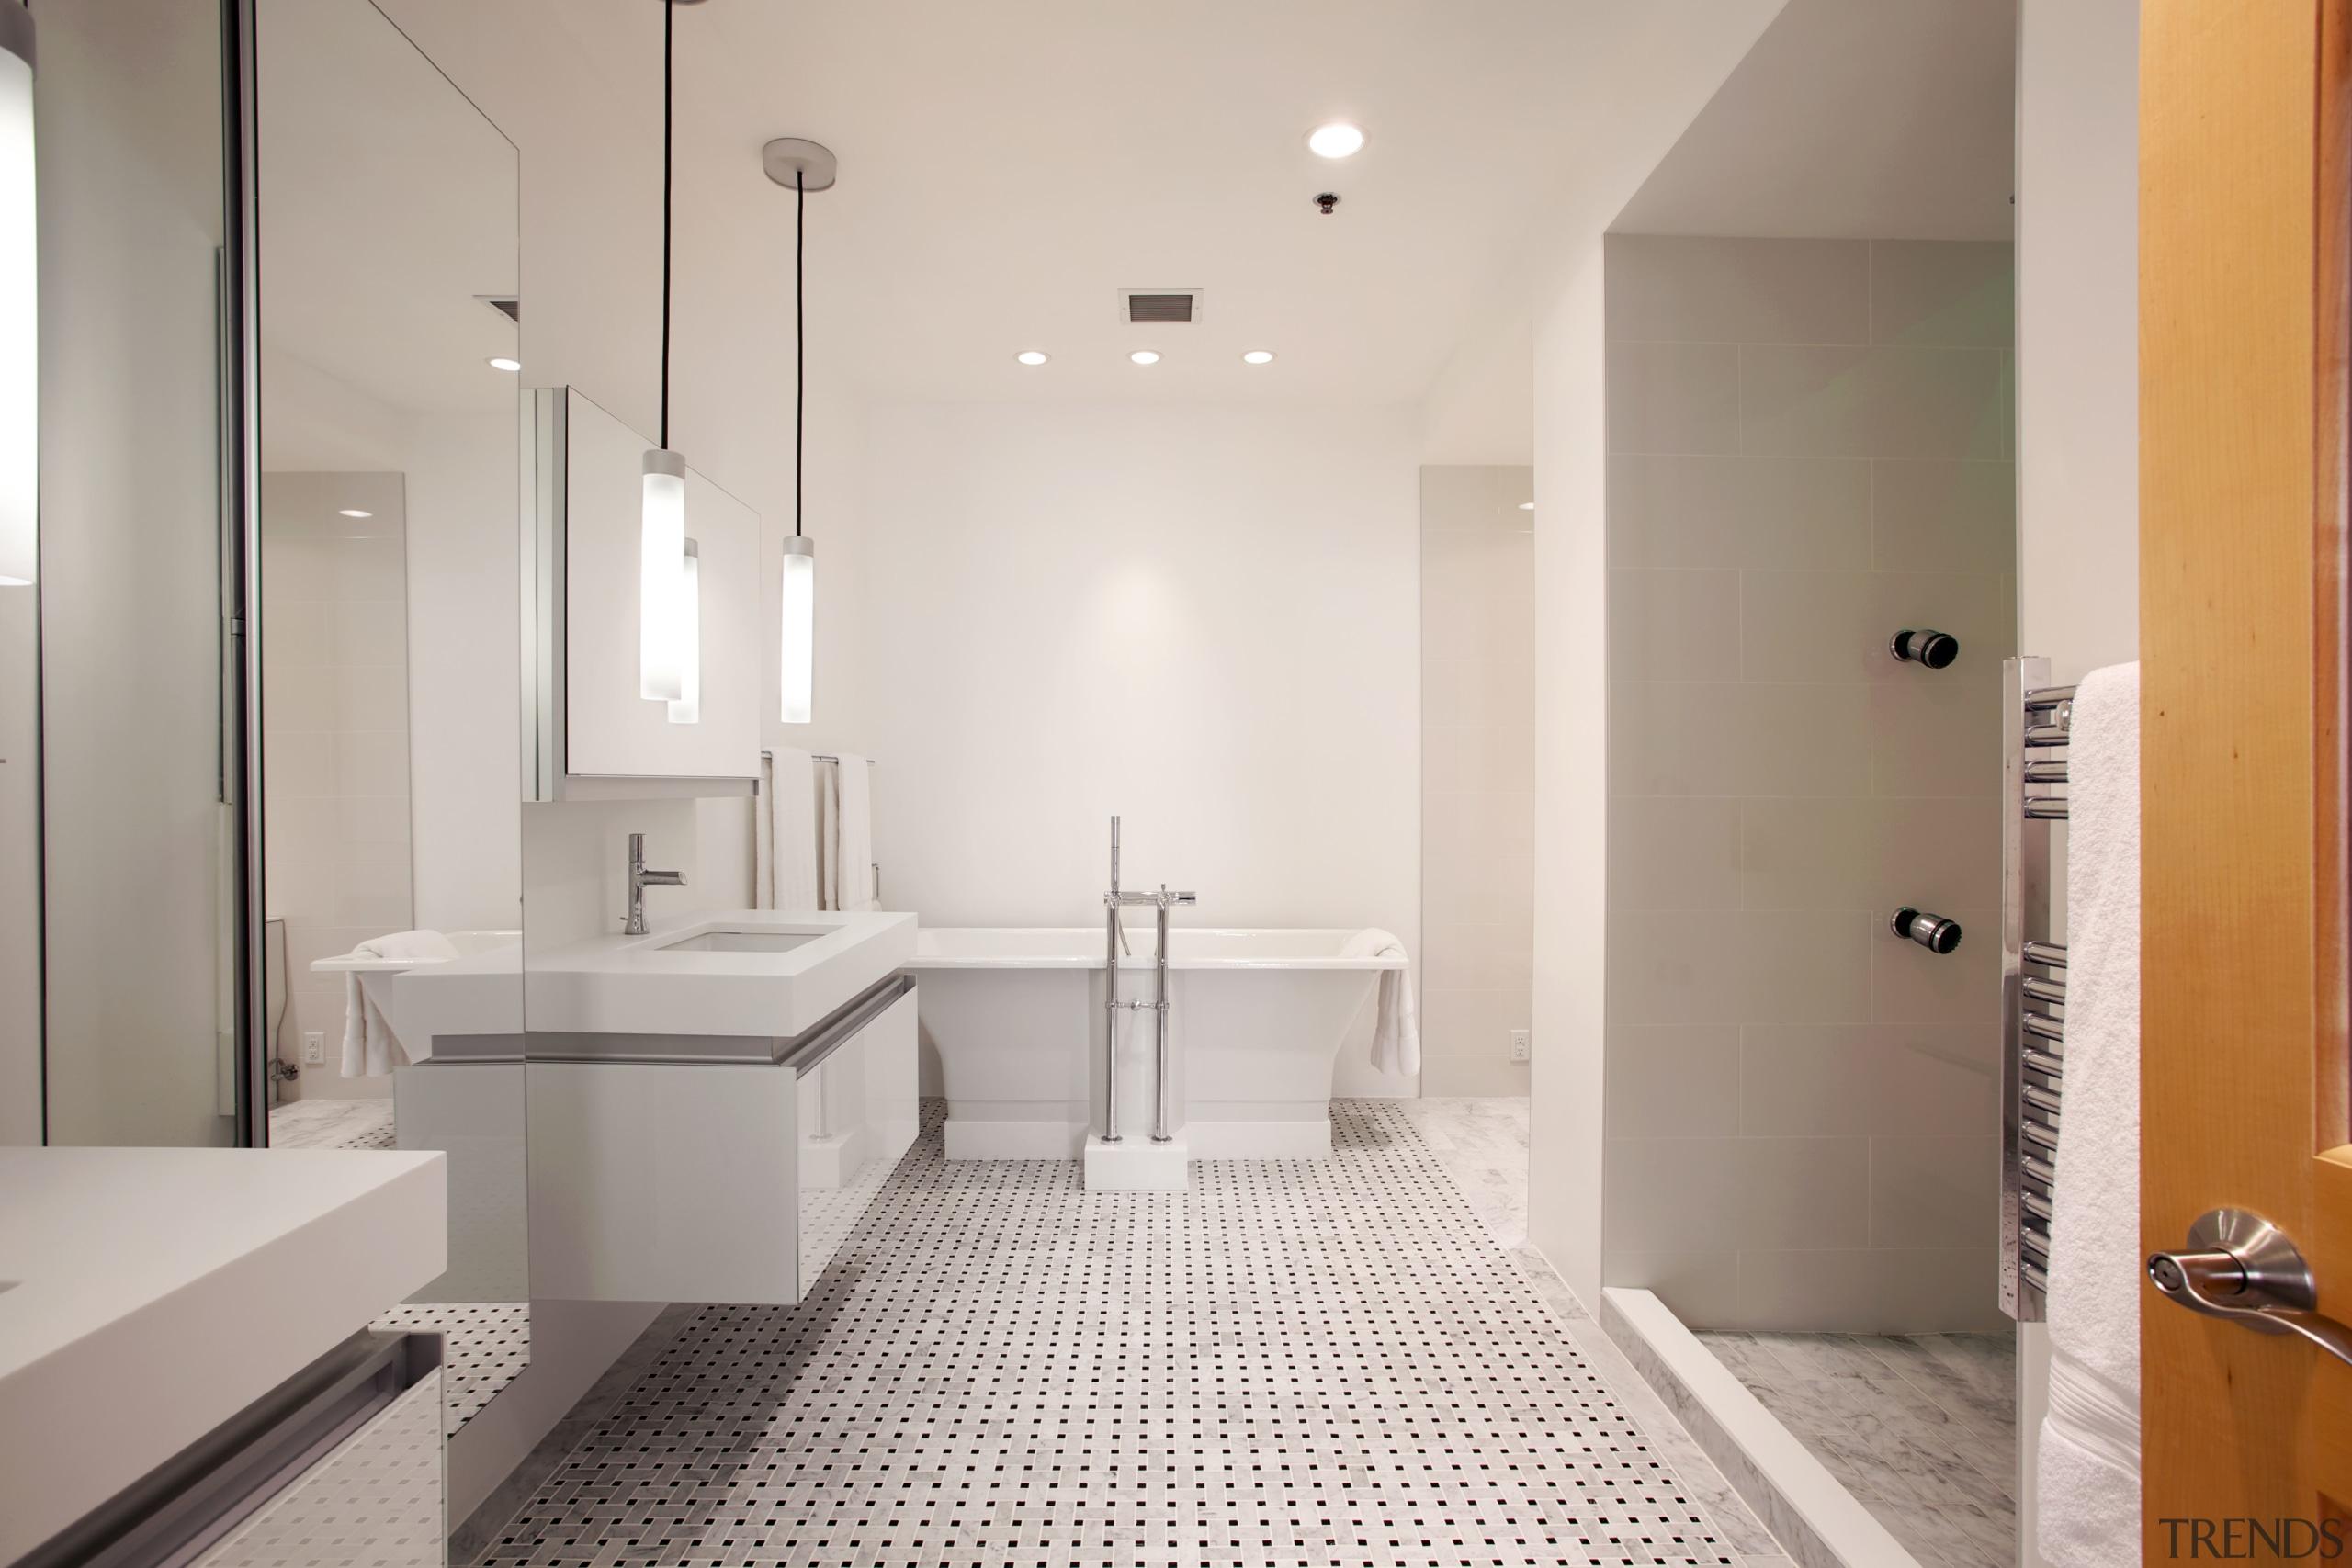 Fresh white bathroom with chromatherapy - Fresh white architecture, bathroom, ceiling, floor, flooring, home, interior design, property, real estate, room, sink, tile, gray